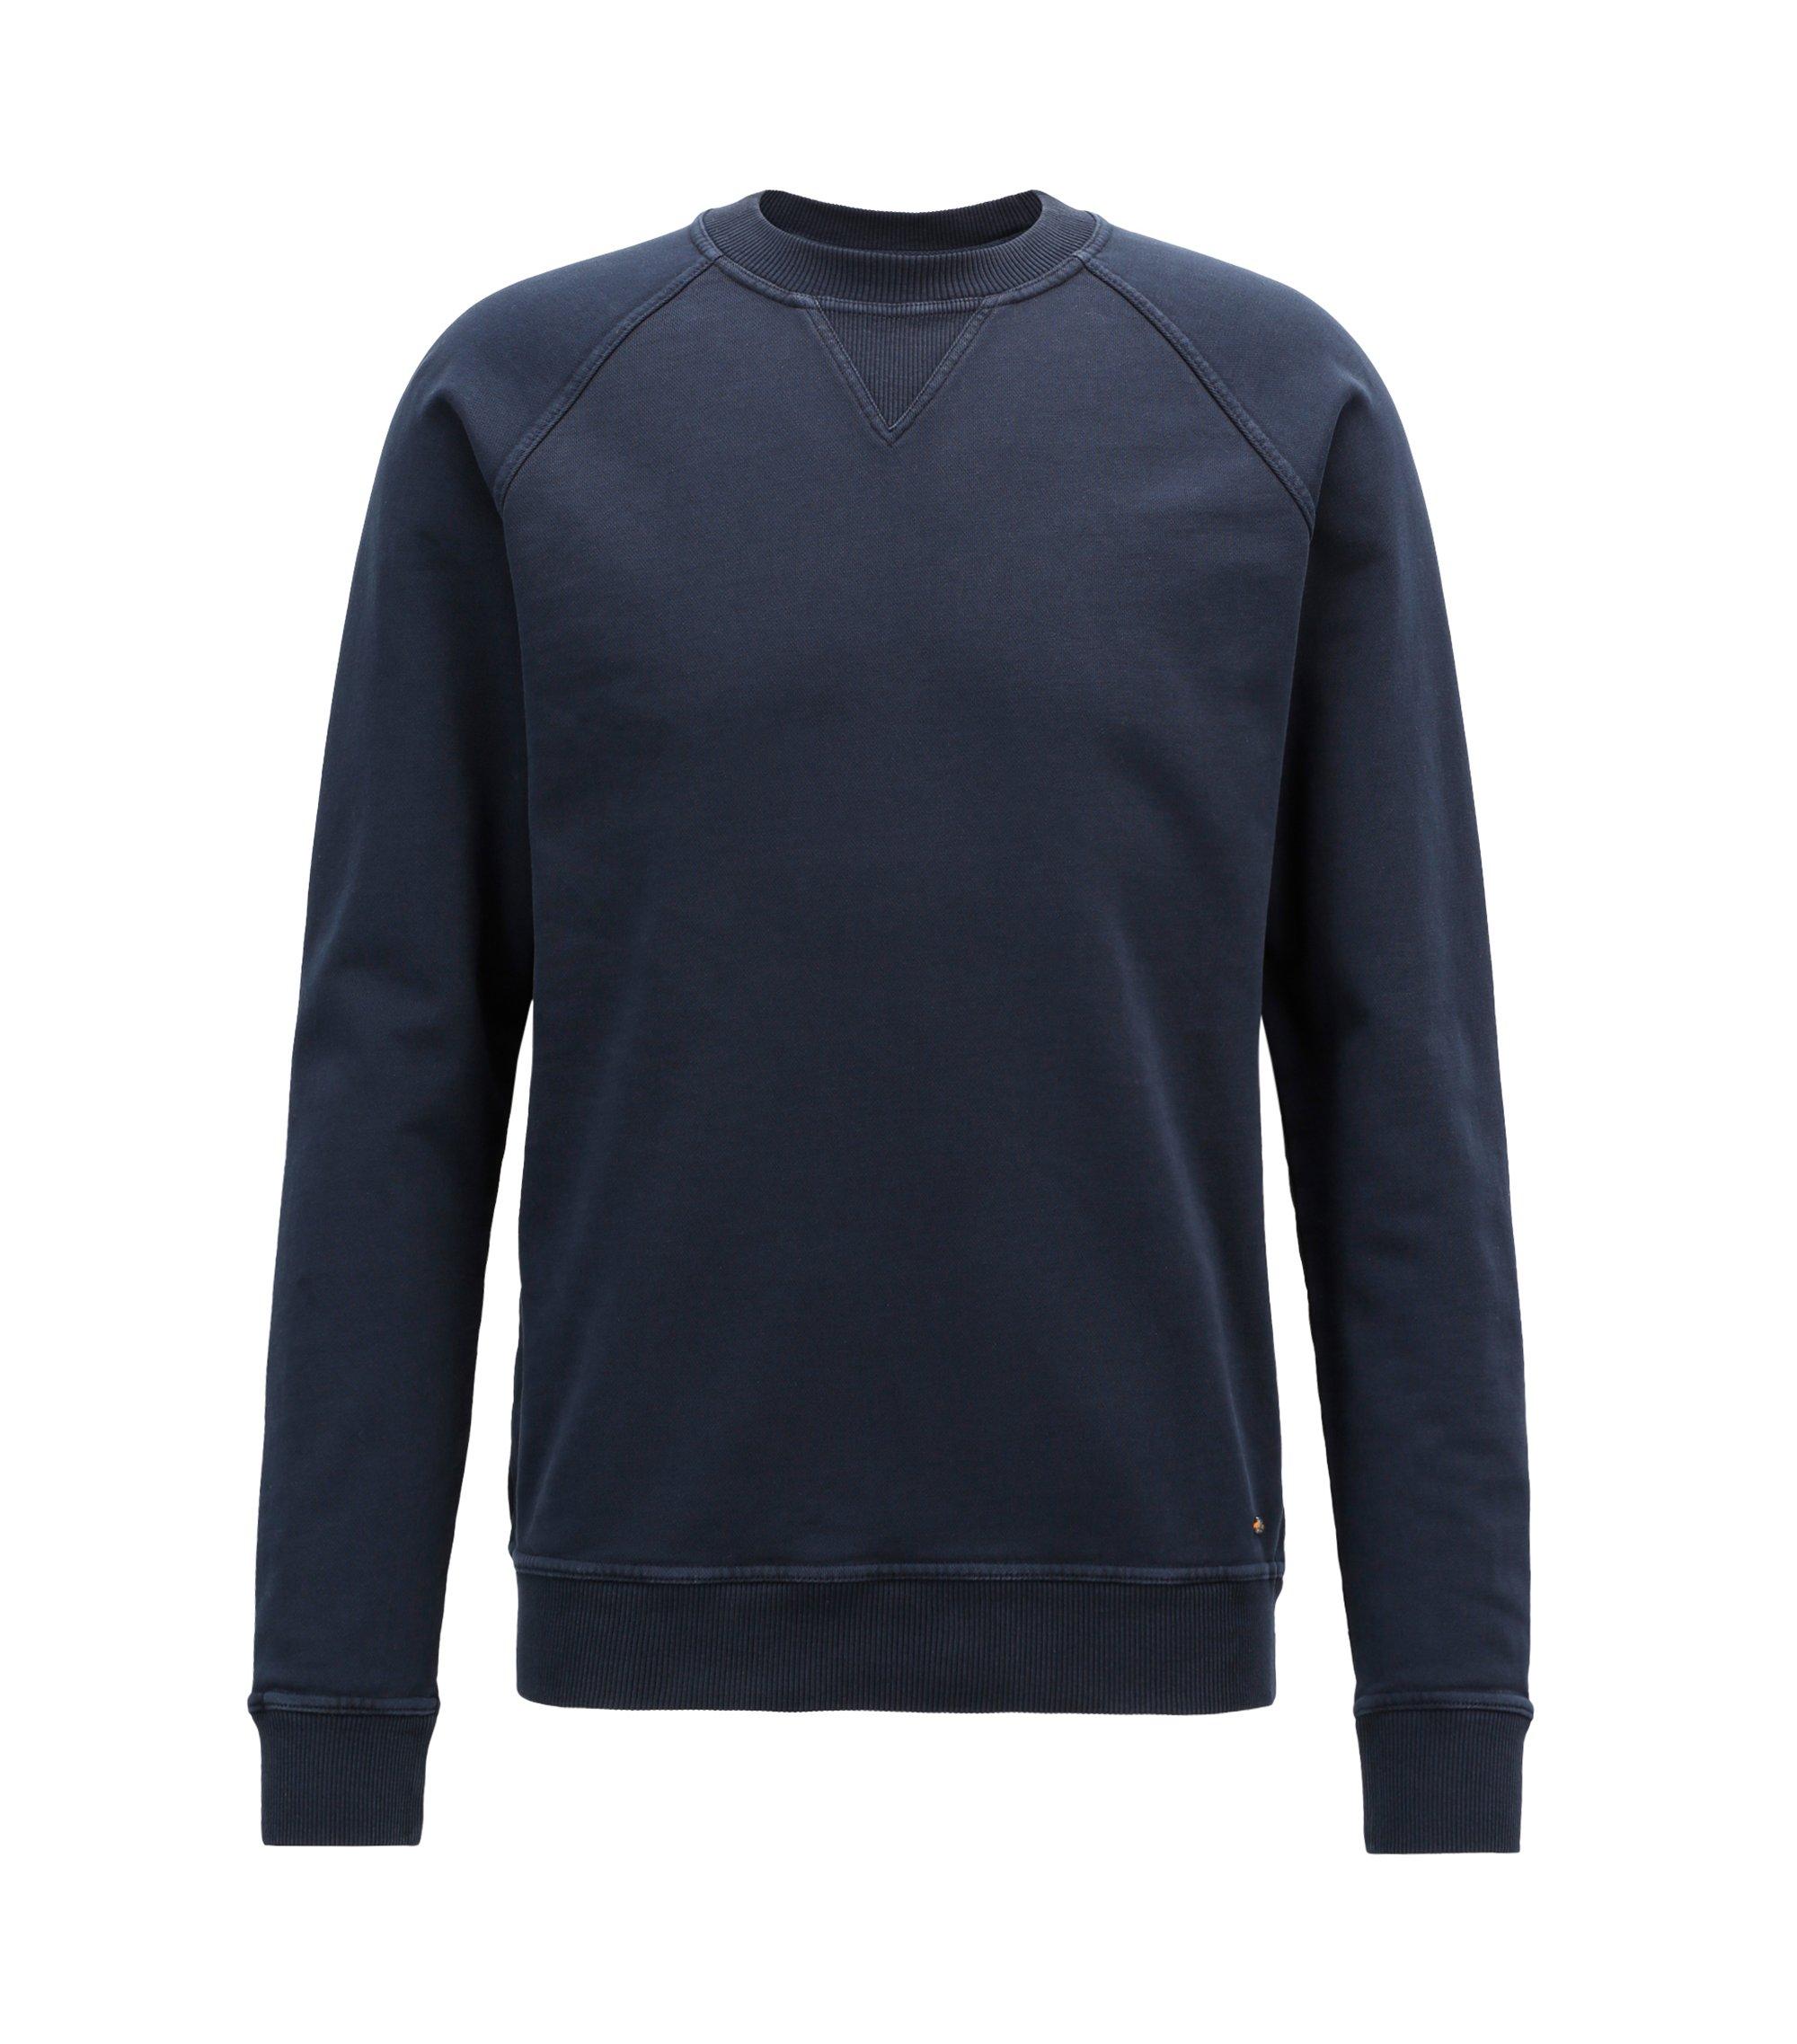 Crew-neck sweatshirt in recot²® French terry, Dark Blue